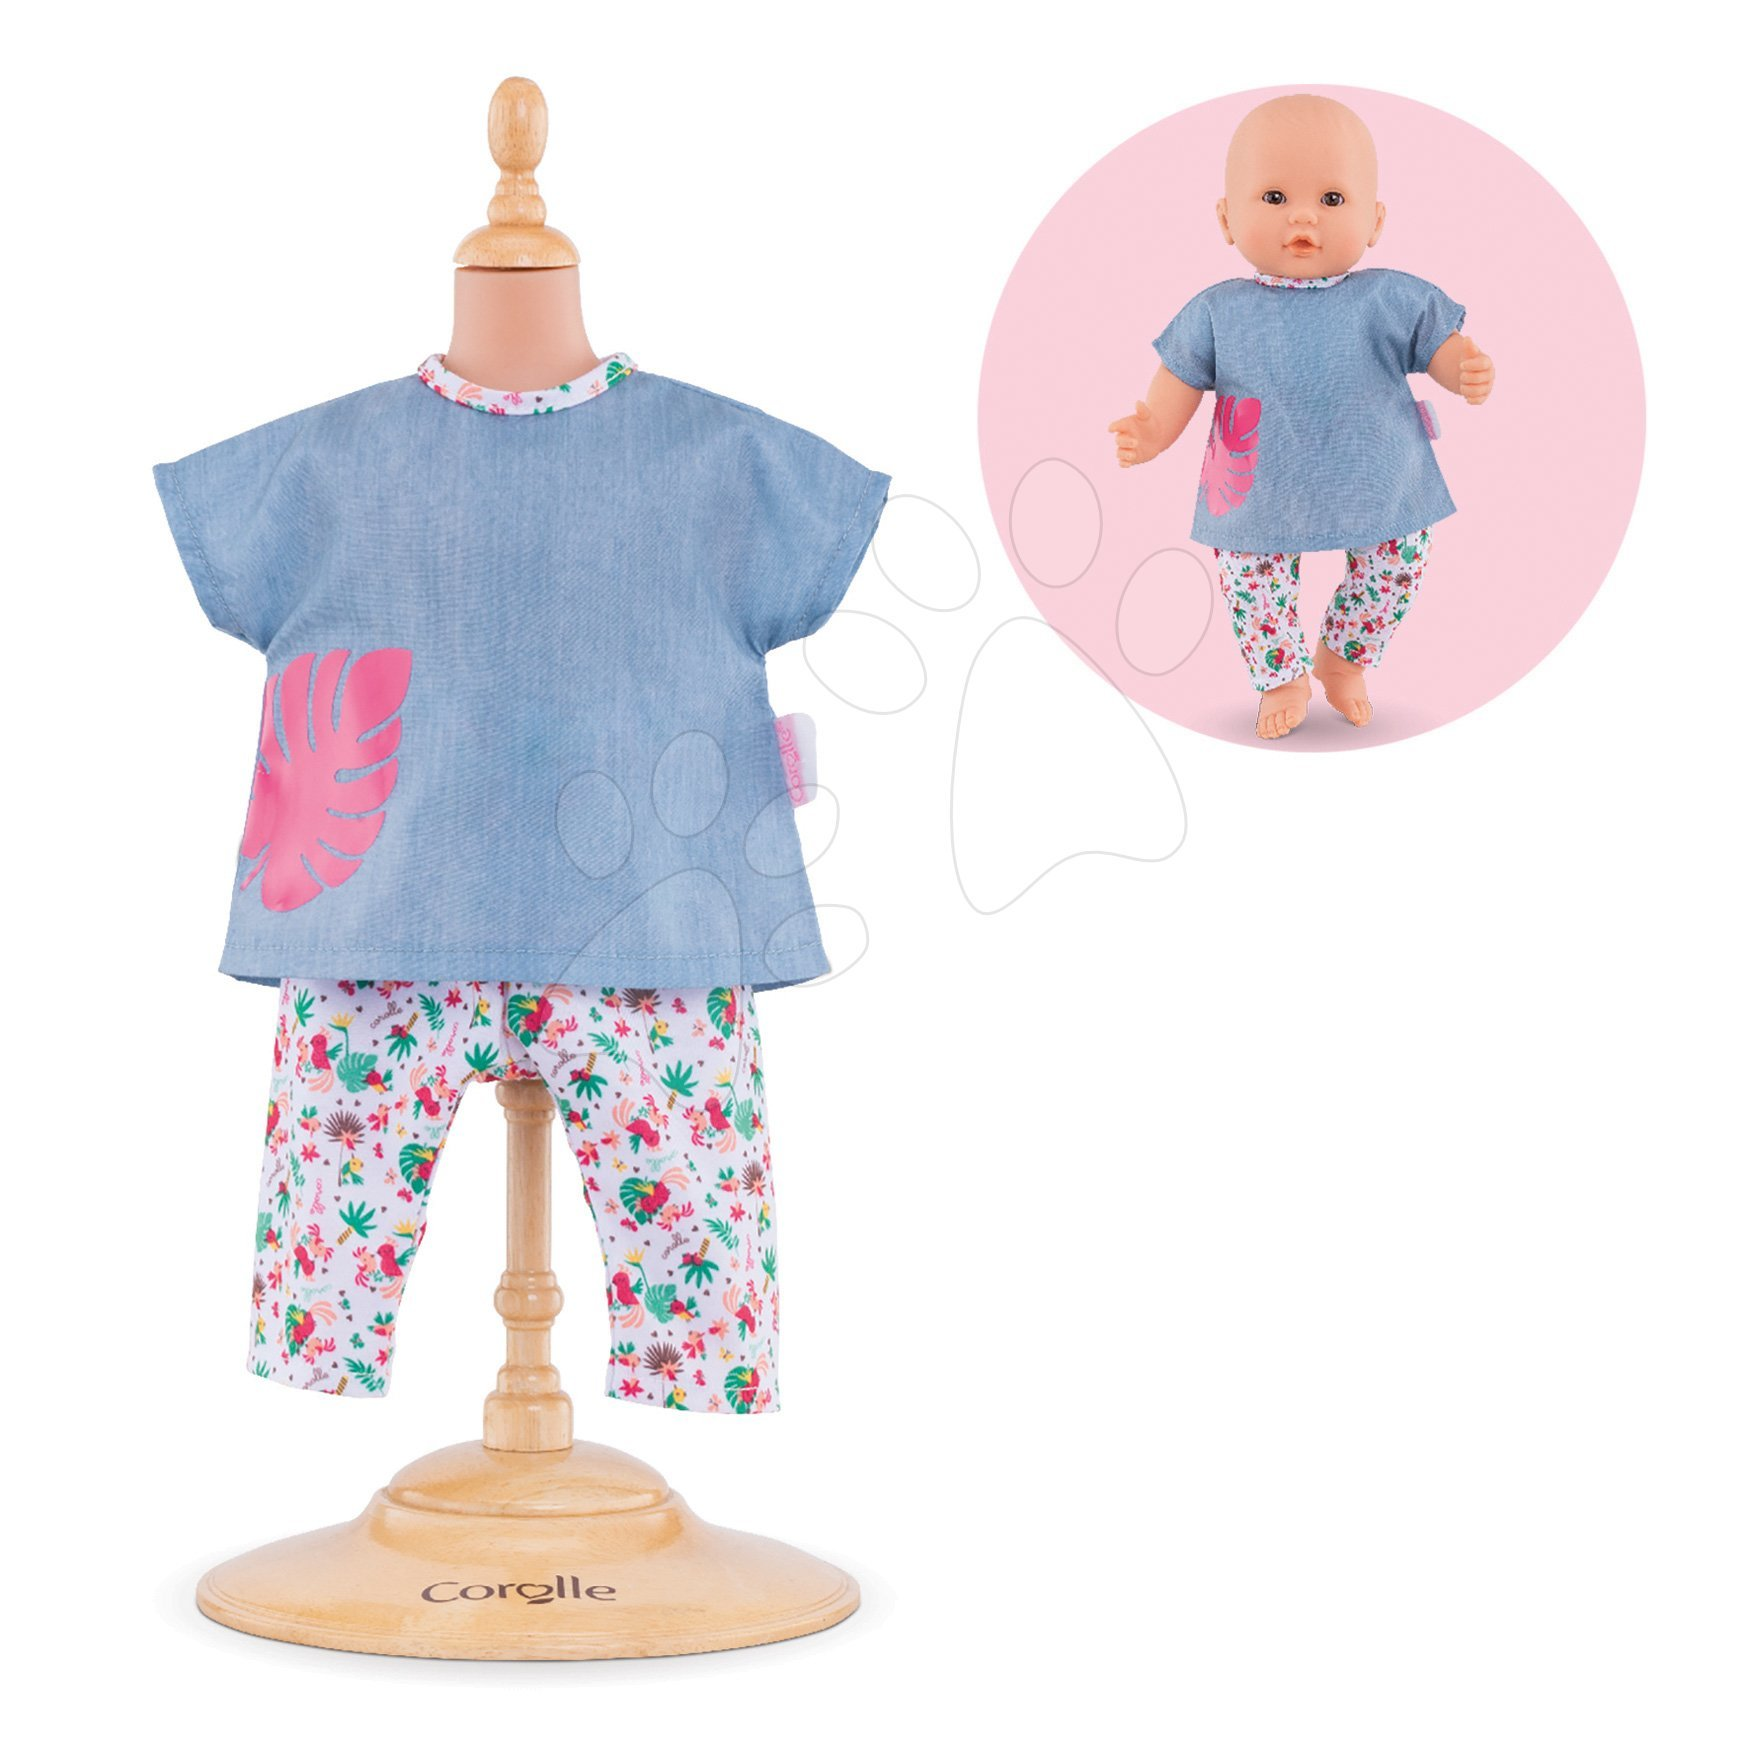 Oblečenie sada Tropicorolle Mon Grand Poupon Corolle pre 36 cm bábiku od 24 mes